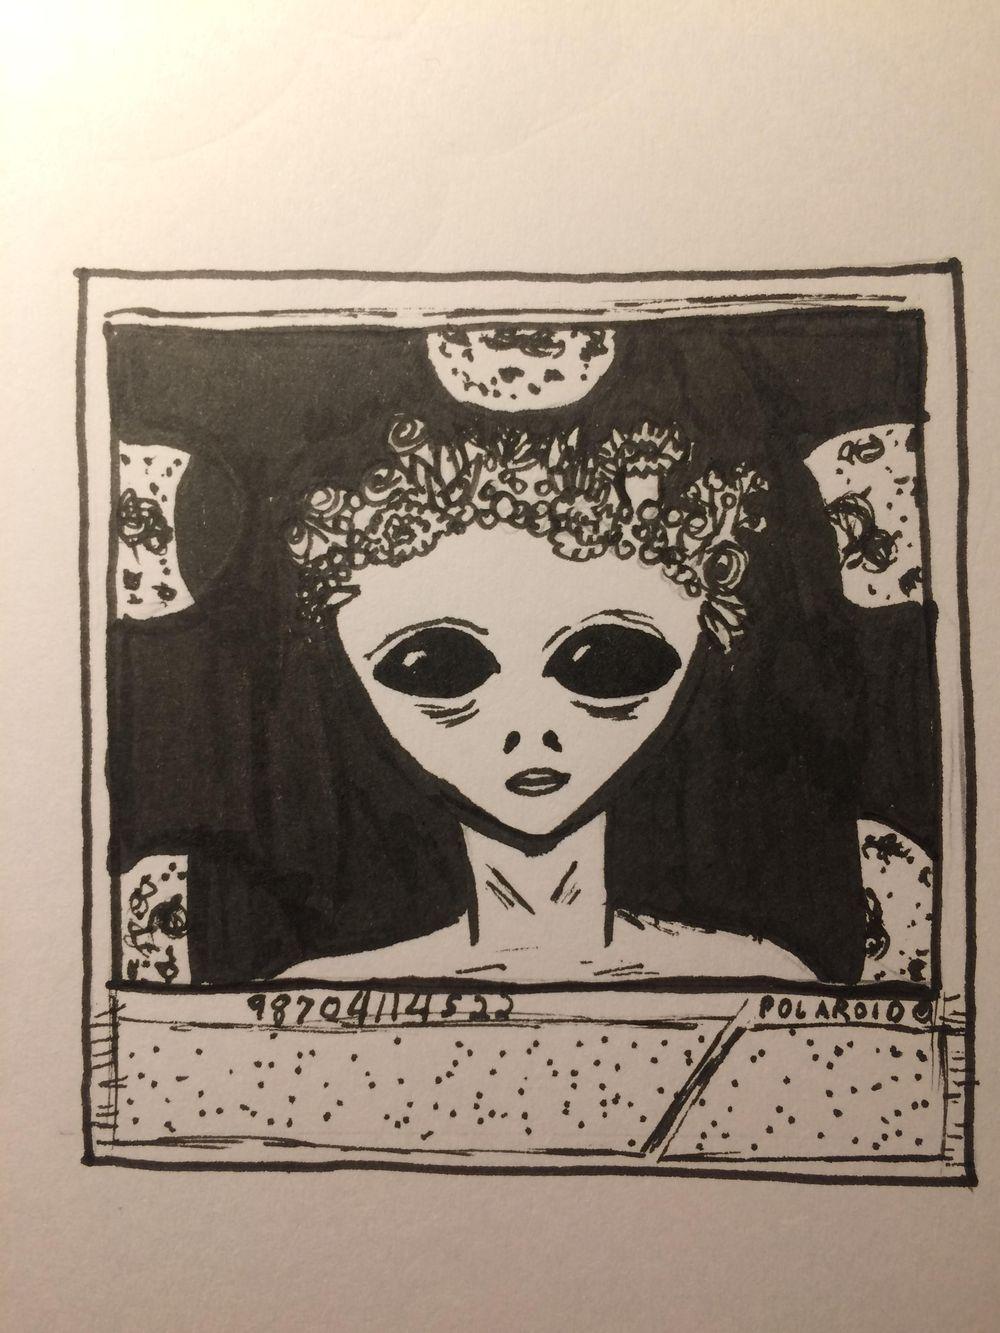 Alien Polaroid  - image 3 - student project